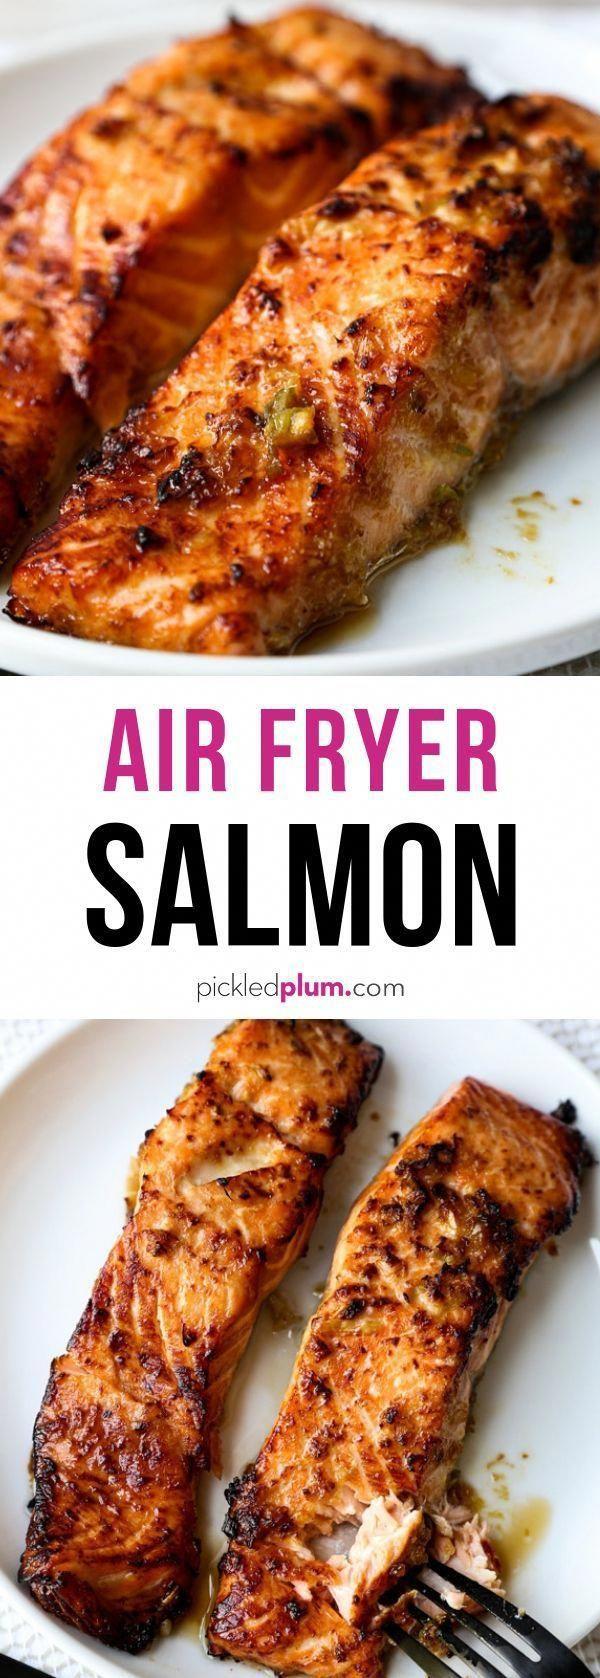 air fryer recipes good #RecipesforAirFryers